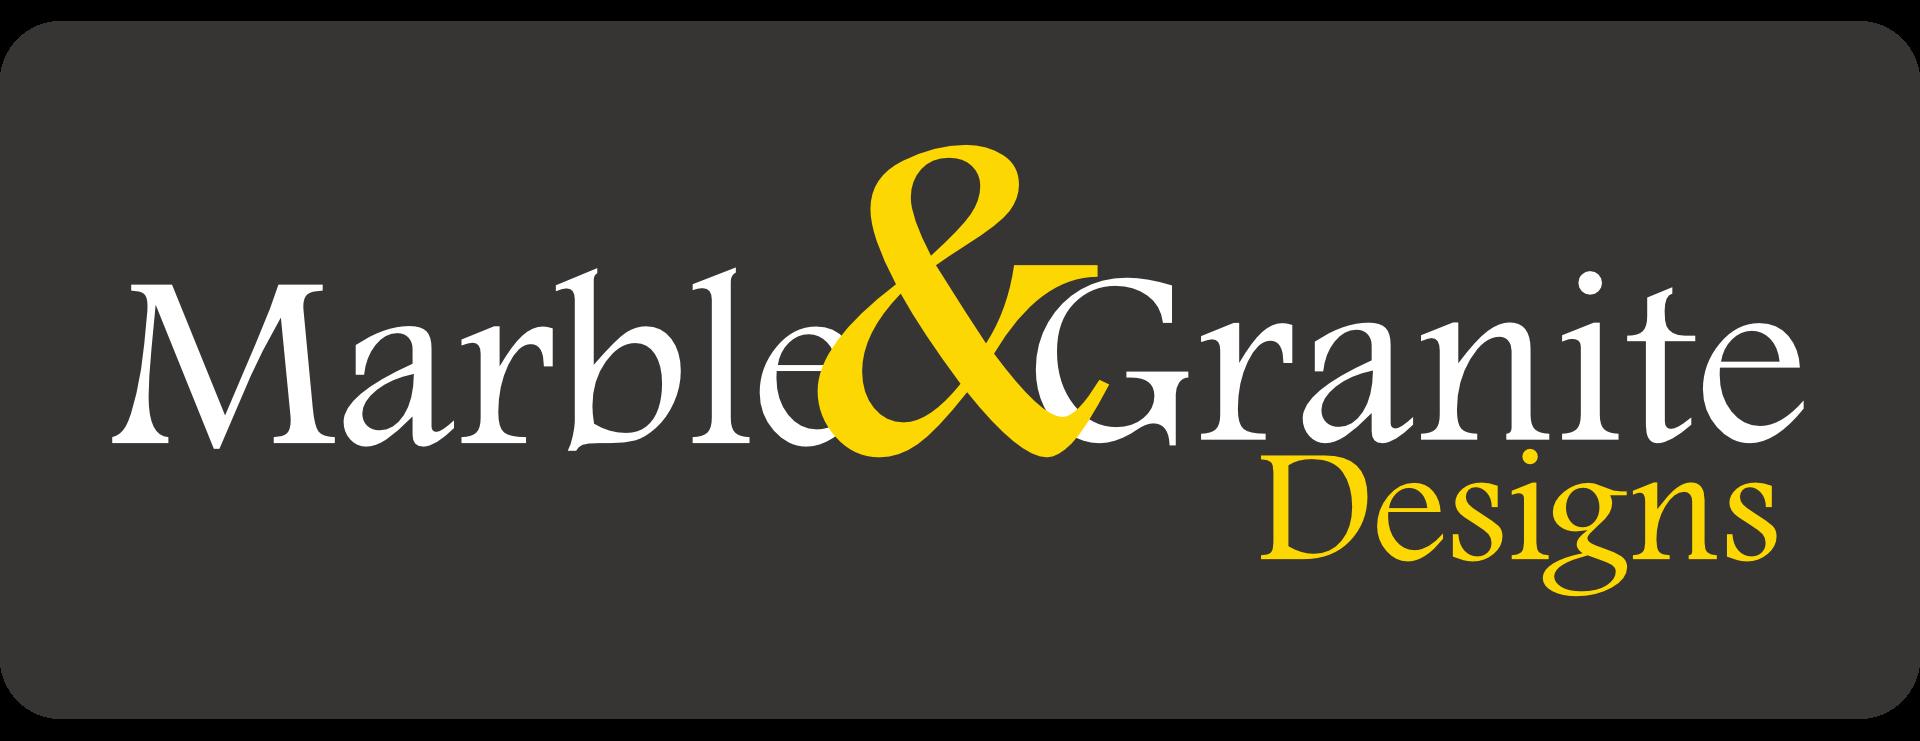 Marble & Granite Designs Ltd